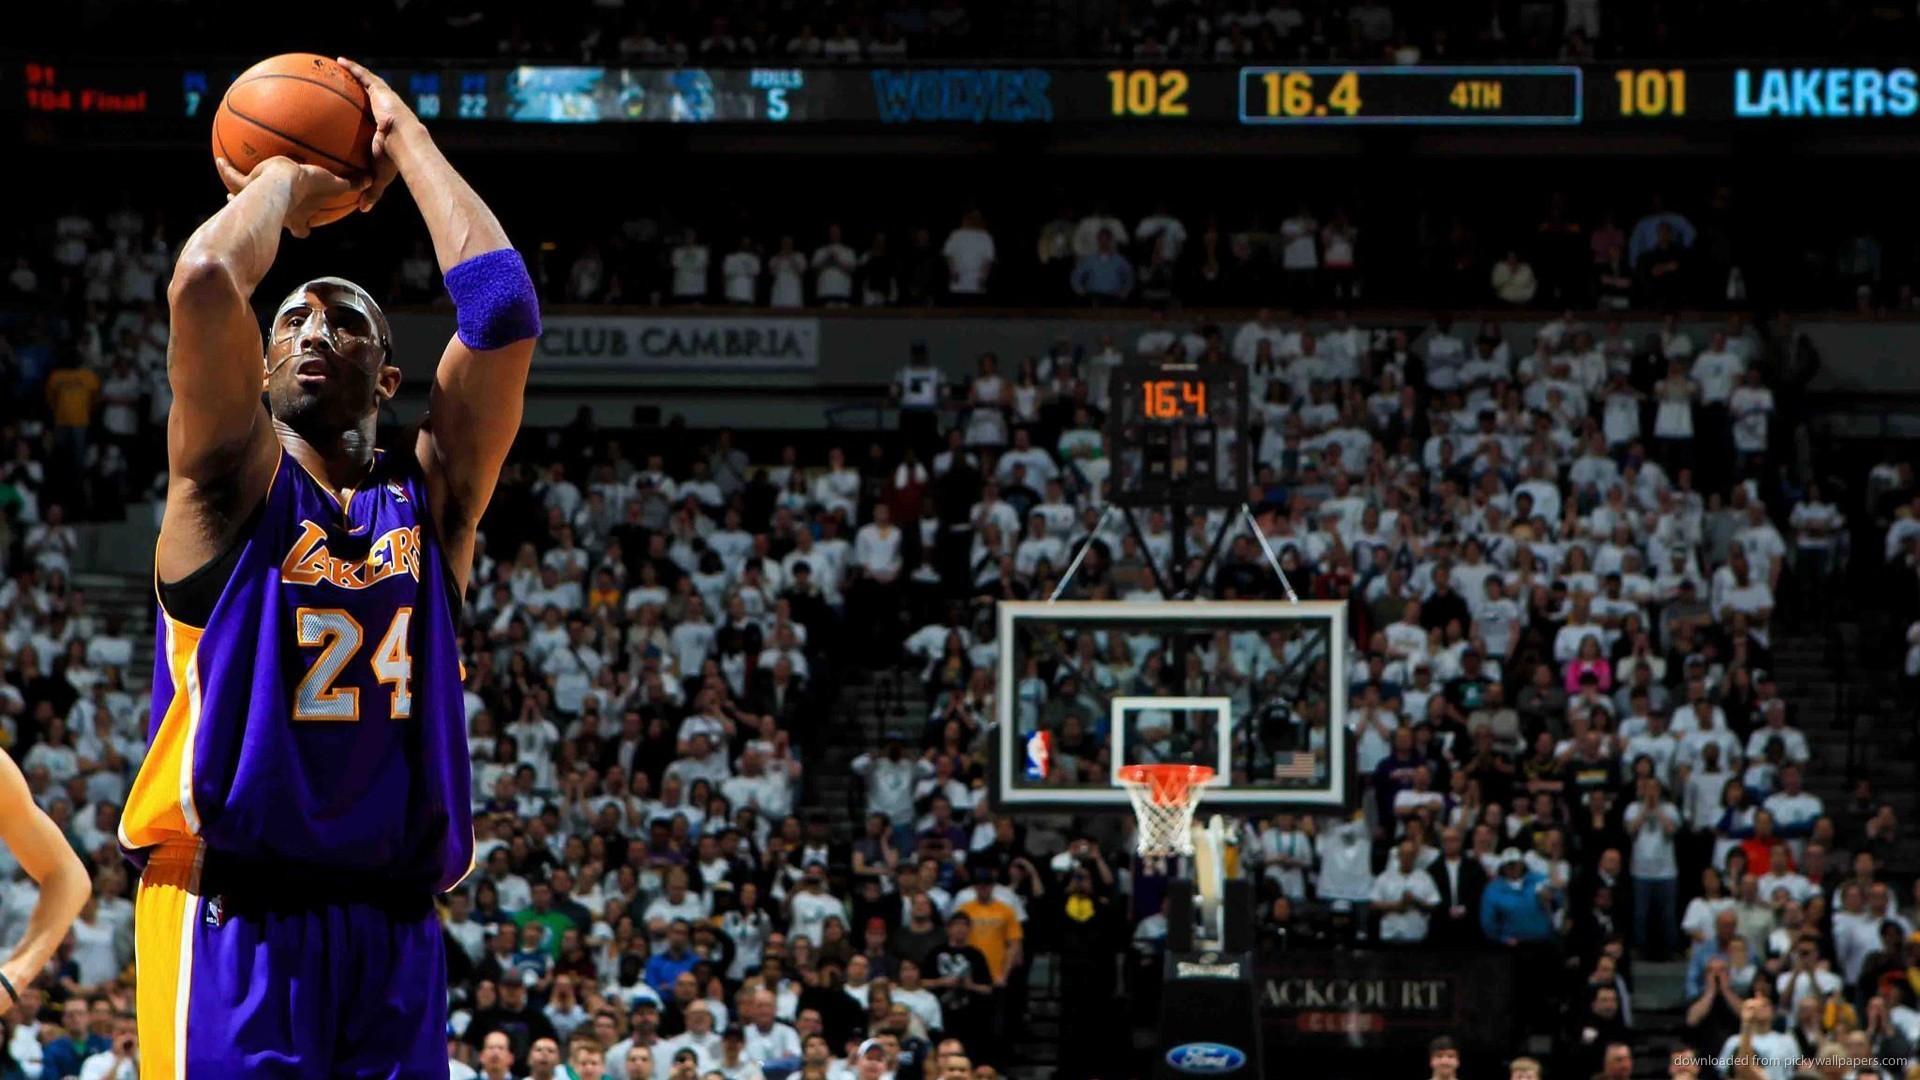 High Resolution NBA Basketball Kobe Bryant Wallpaper HD 2 Full .